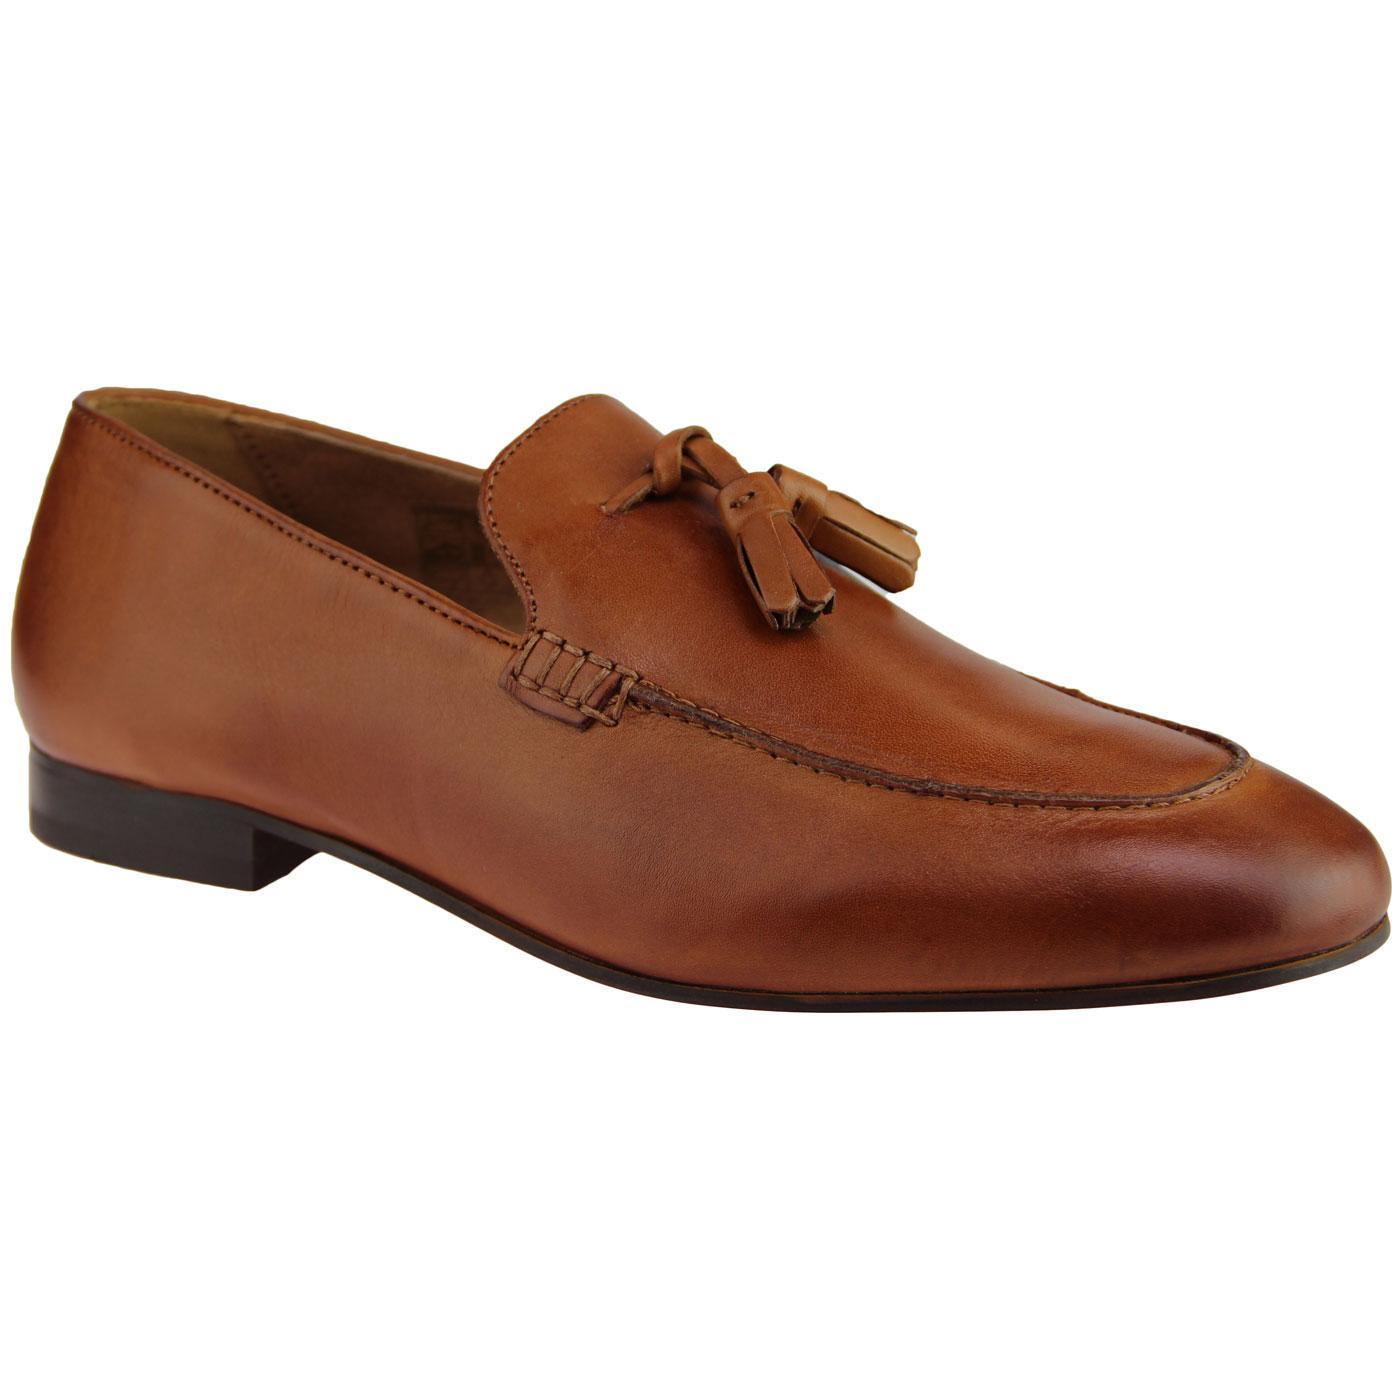 Bolton HUDSON Retro Mod Leather Tassel Loafers TAN